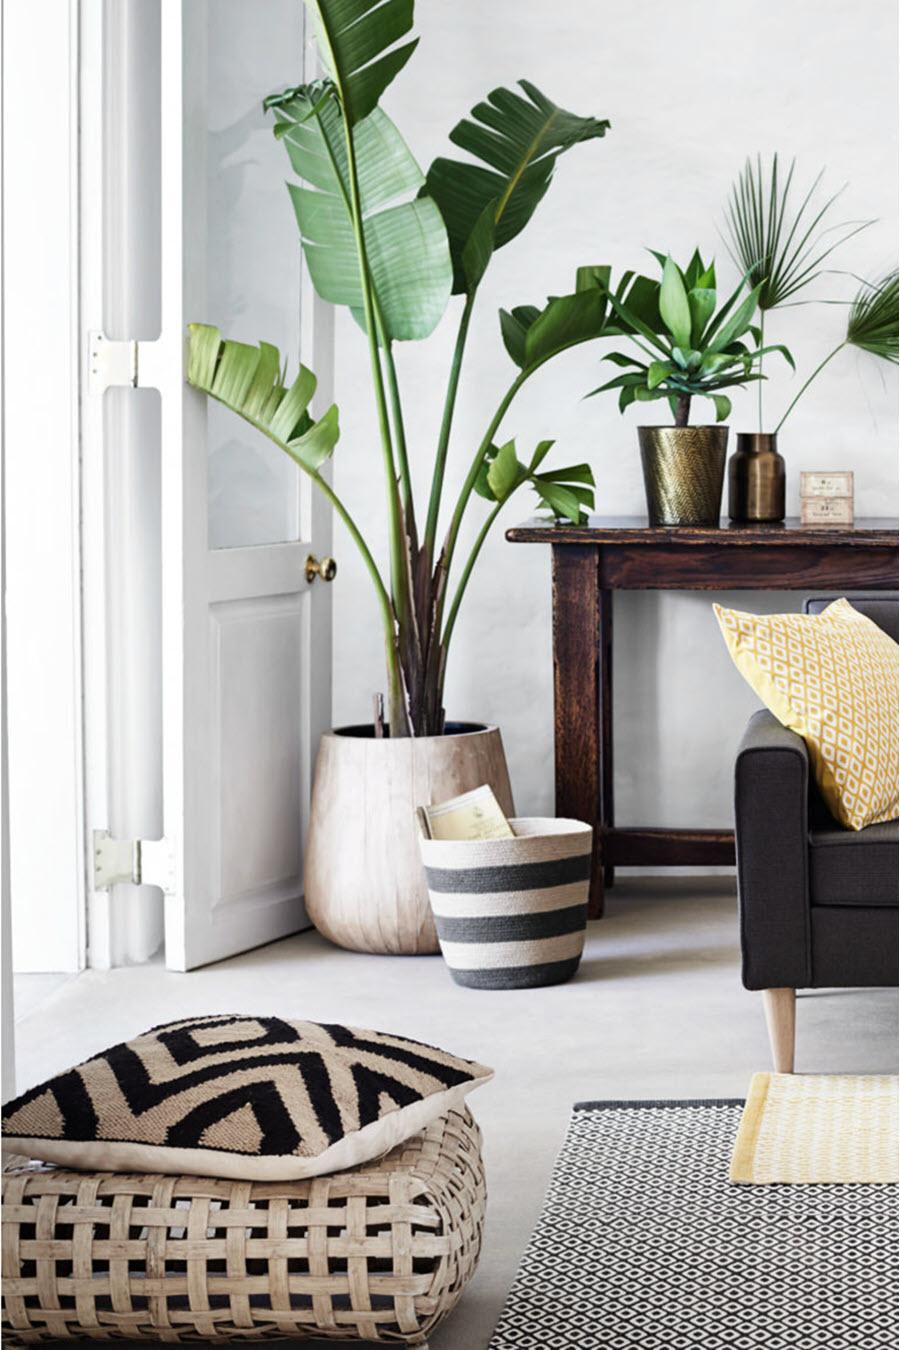 Home Decor Inspiration: Indoor Plant Decor